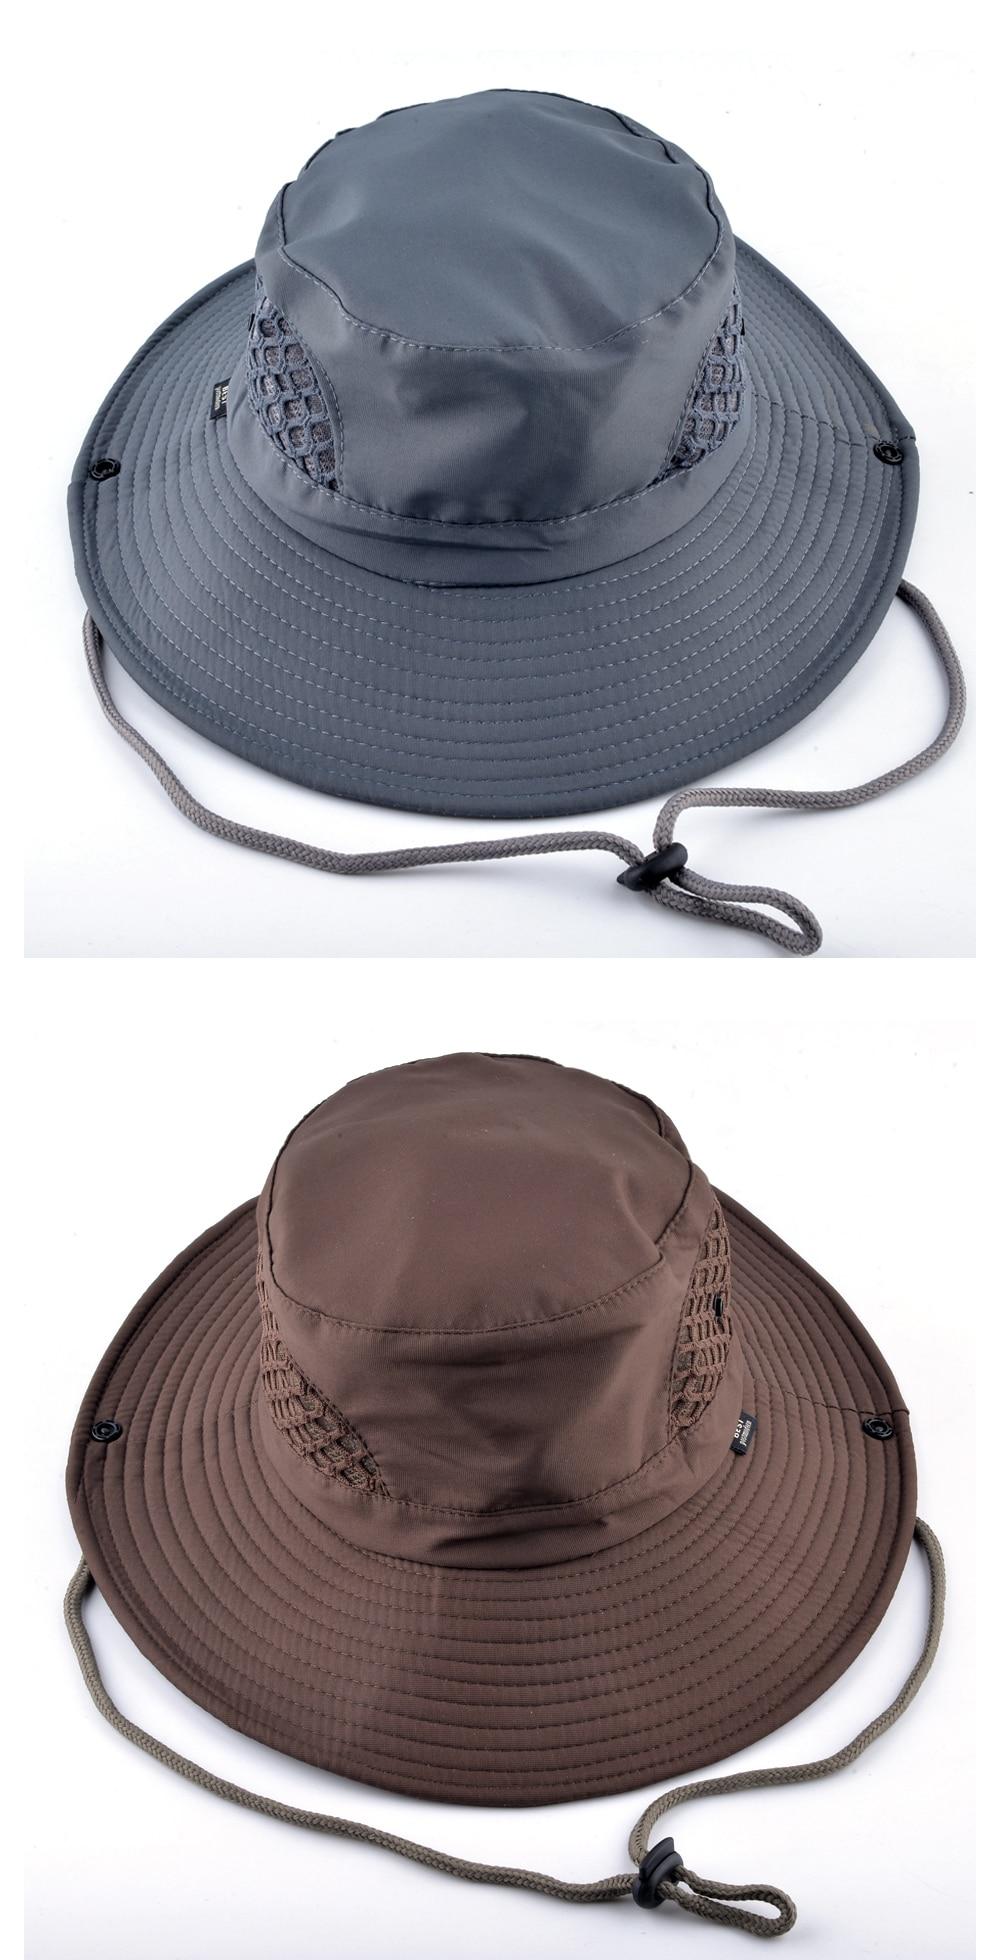 b1bcdcf3521347 Товар Sun Hat men Bucket Hats women Summer Fishin Cap Wide Brim UV ...